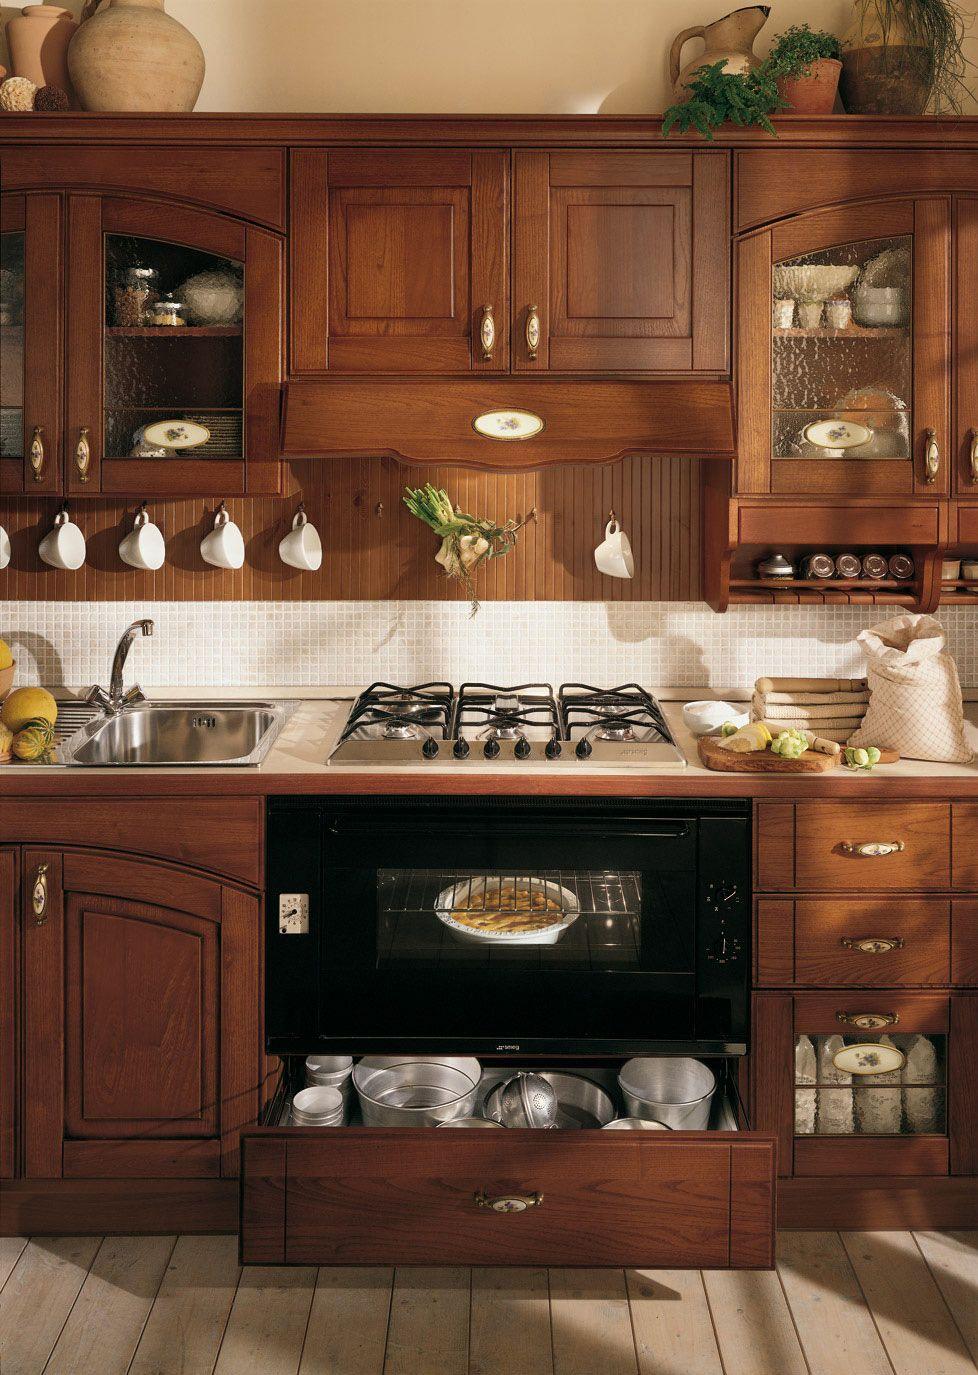 La nostra #cucina #Vismap, in #StileClassico: #CucinaLaura ...